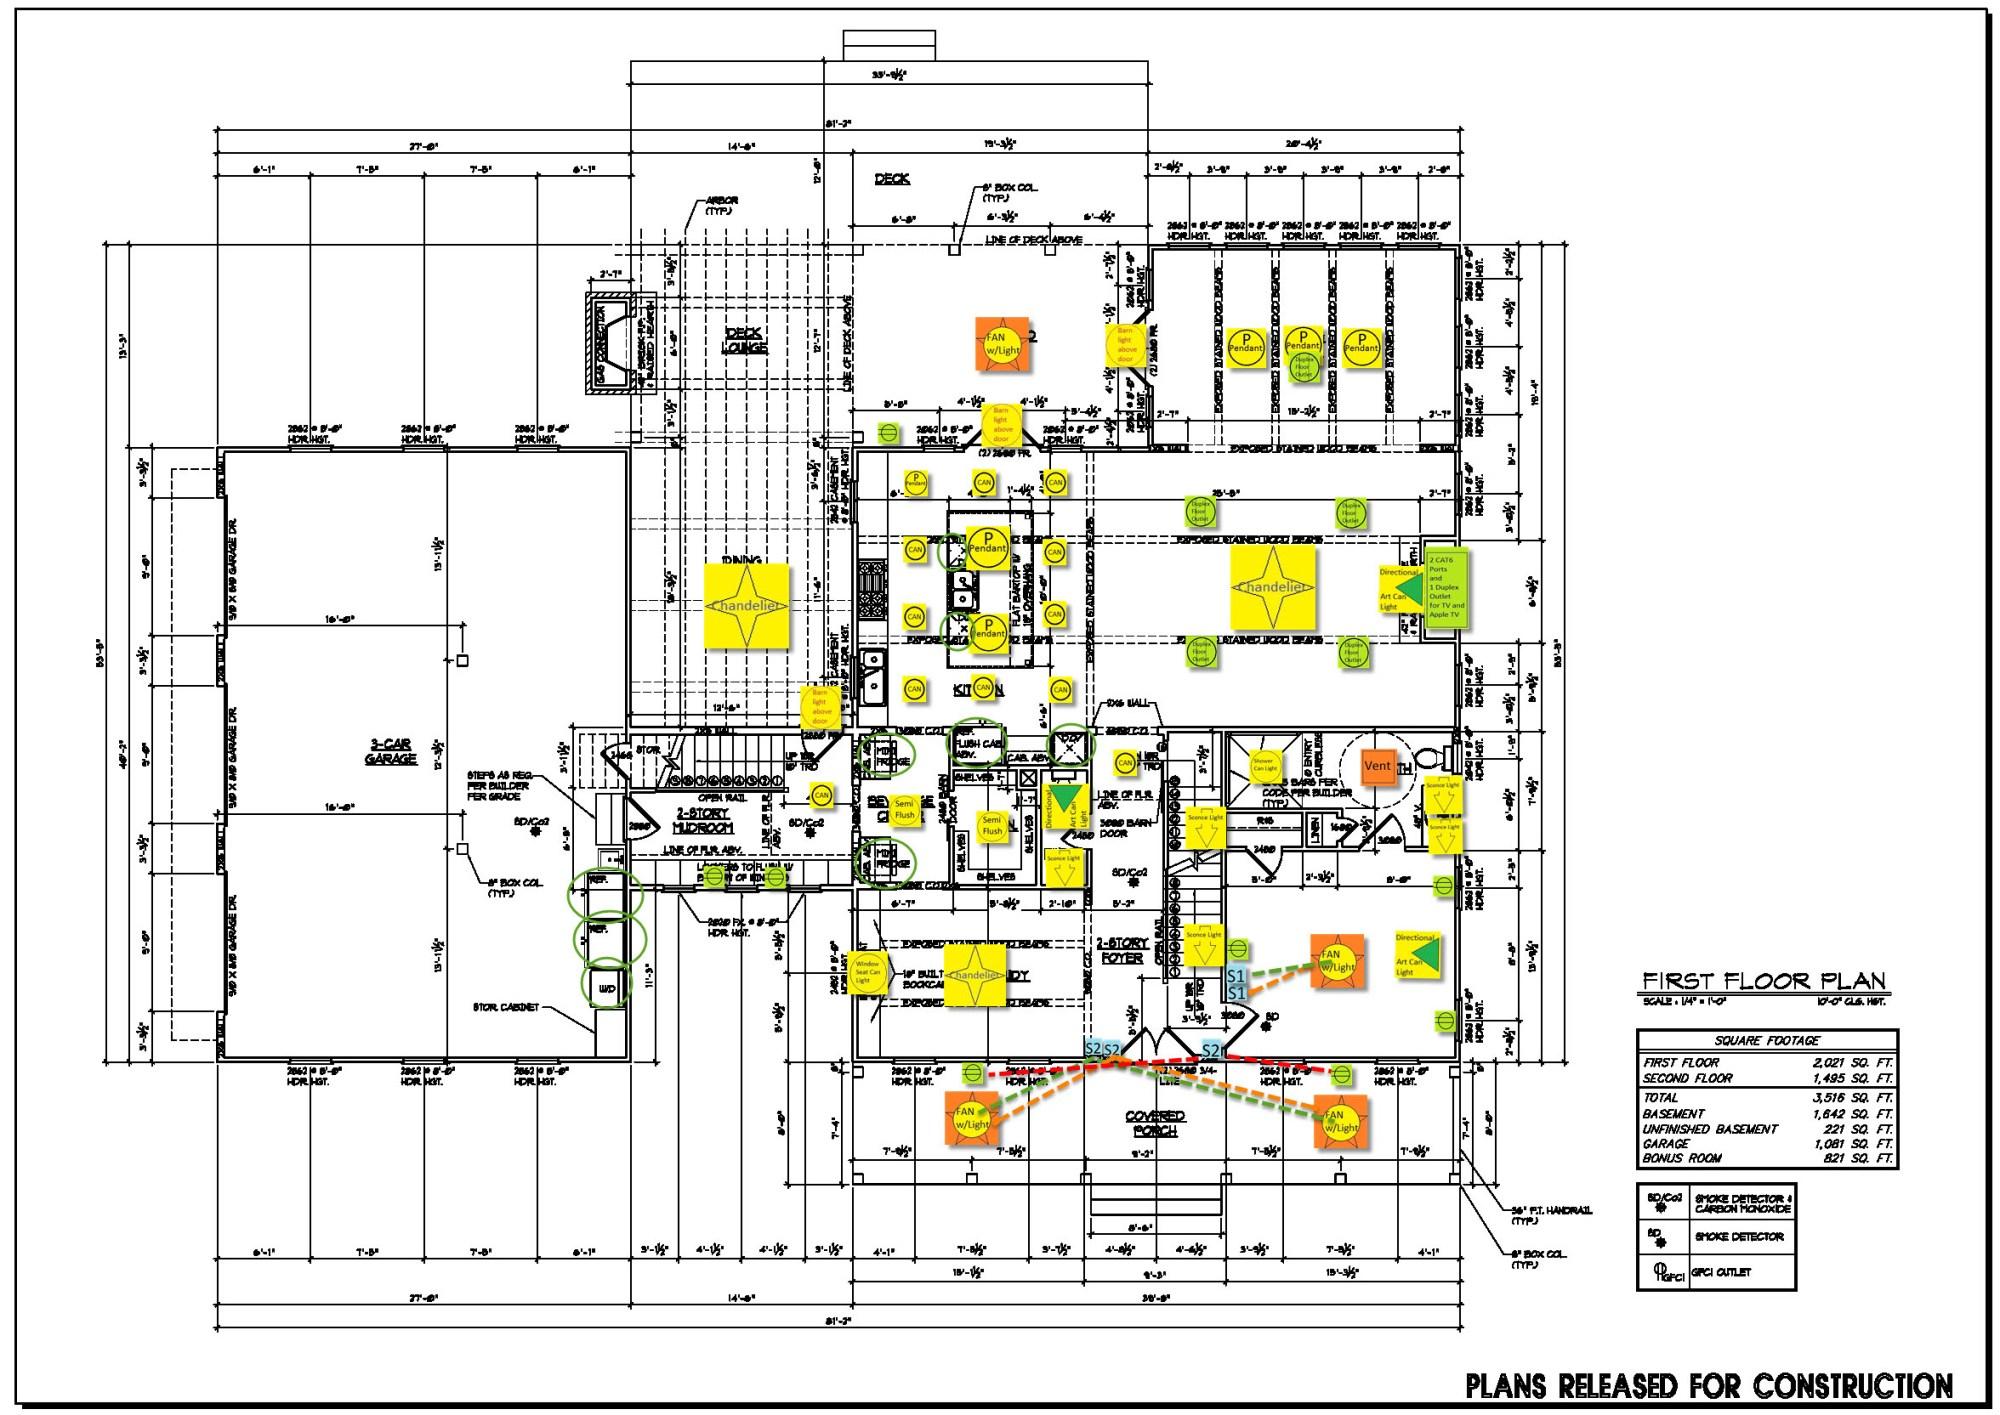 hight resolution of basement floor electrical plan first floor electrical plan